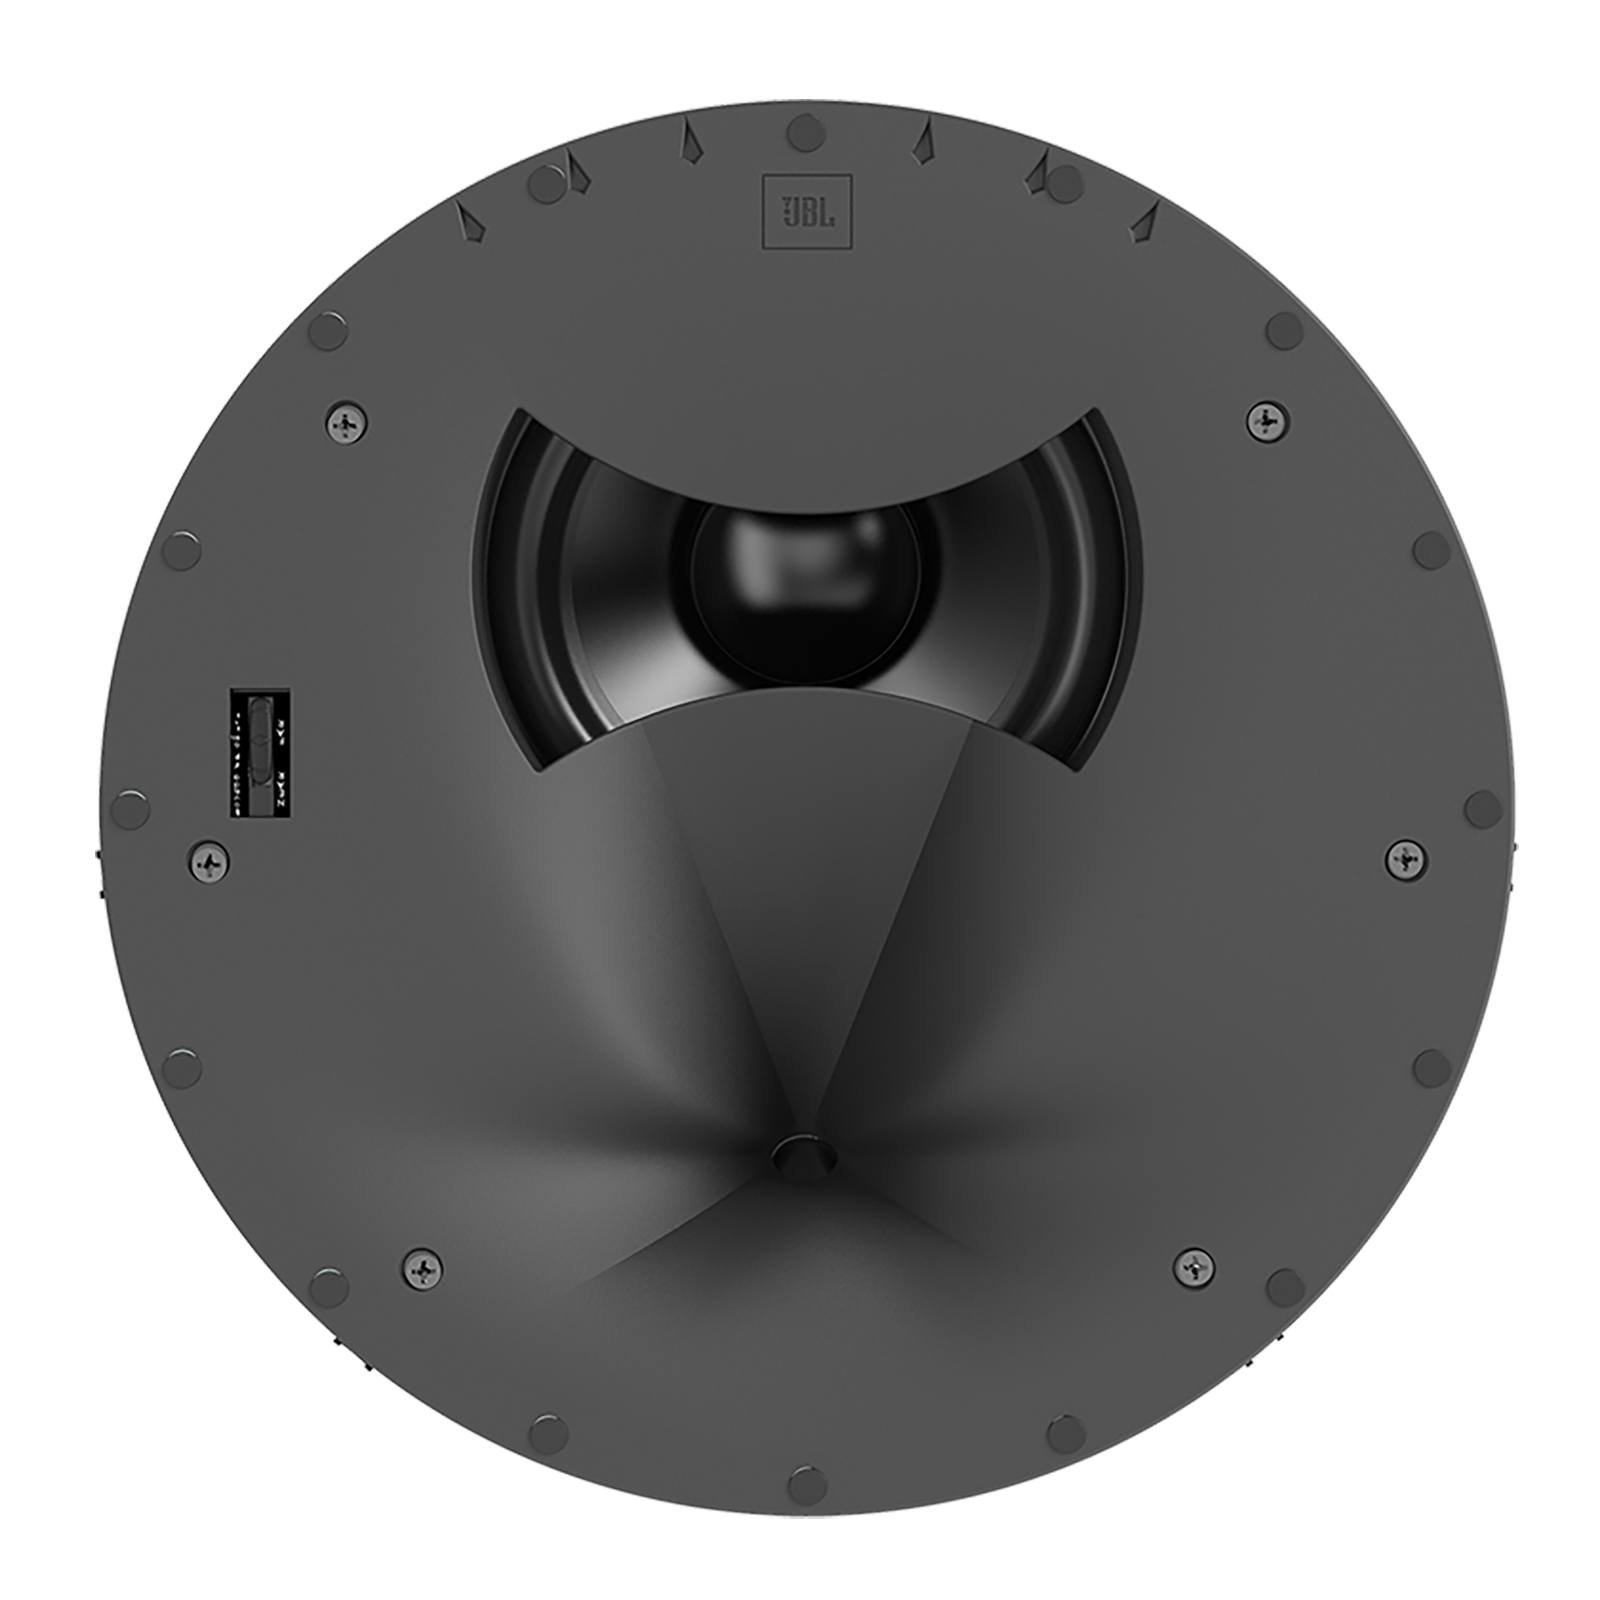 SCL-5 - Black - 2-Way 7-inch (180mm) In-Ceiling Loudspeaker - Detailshot 5